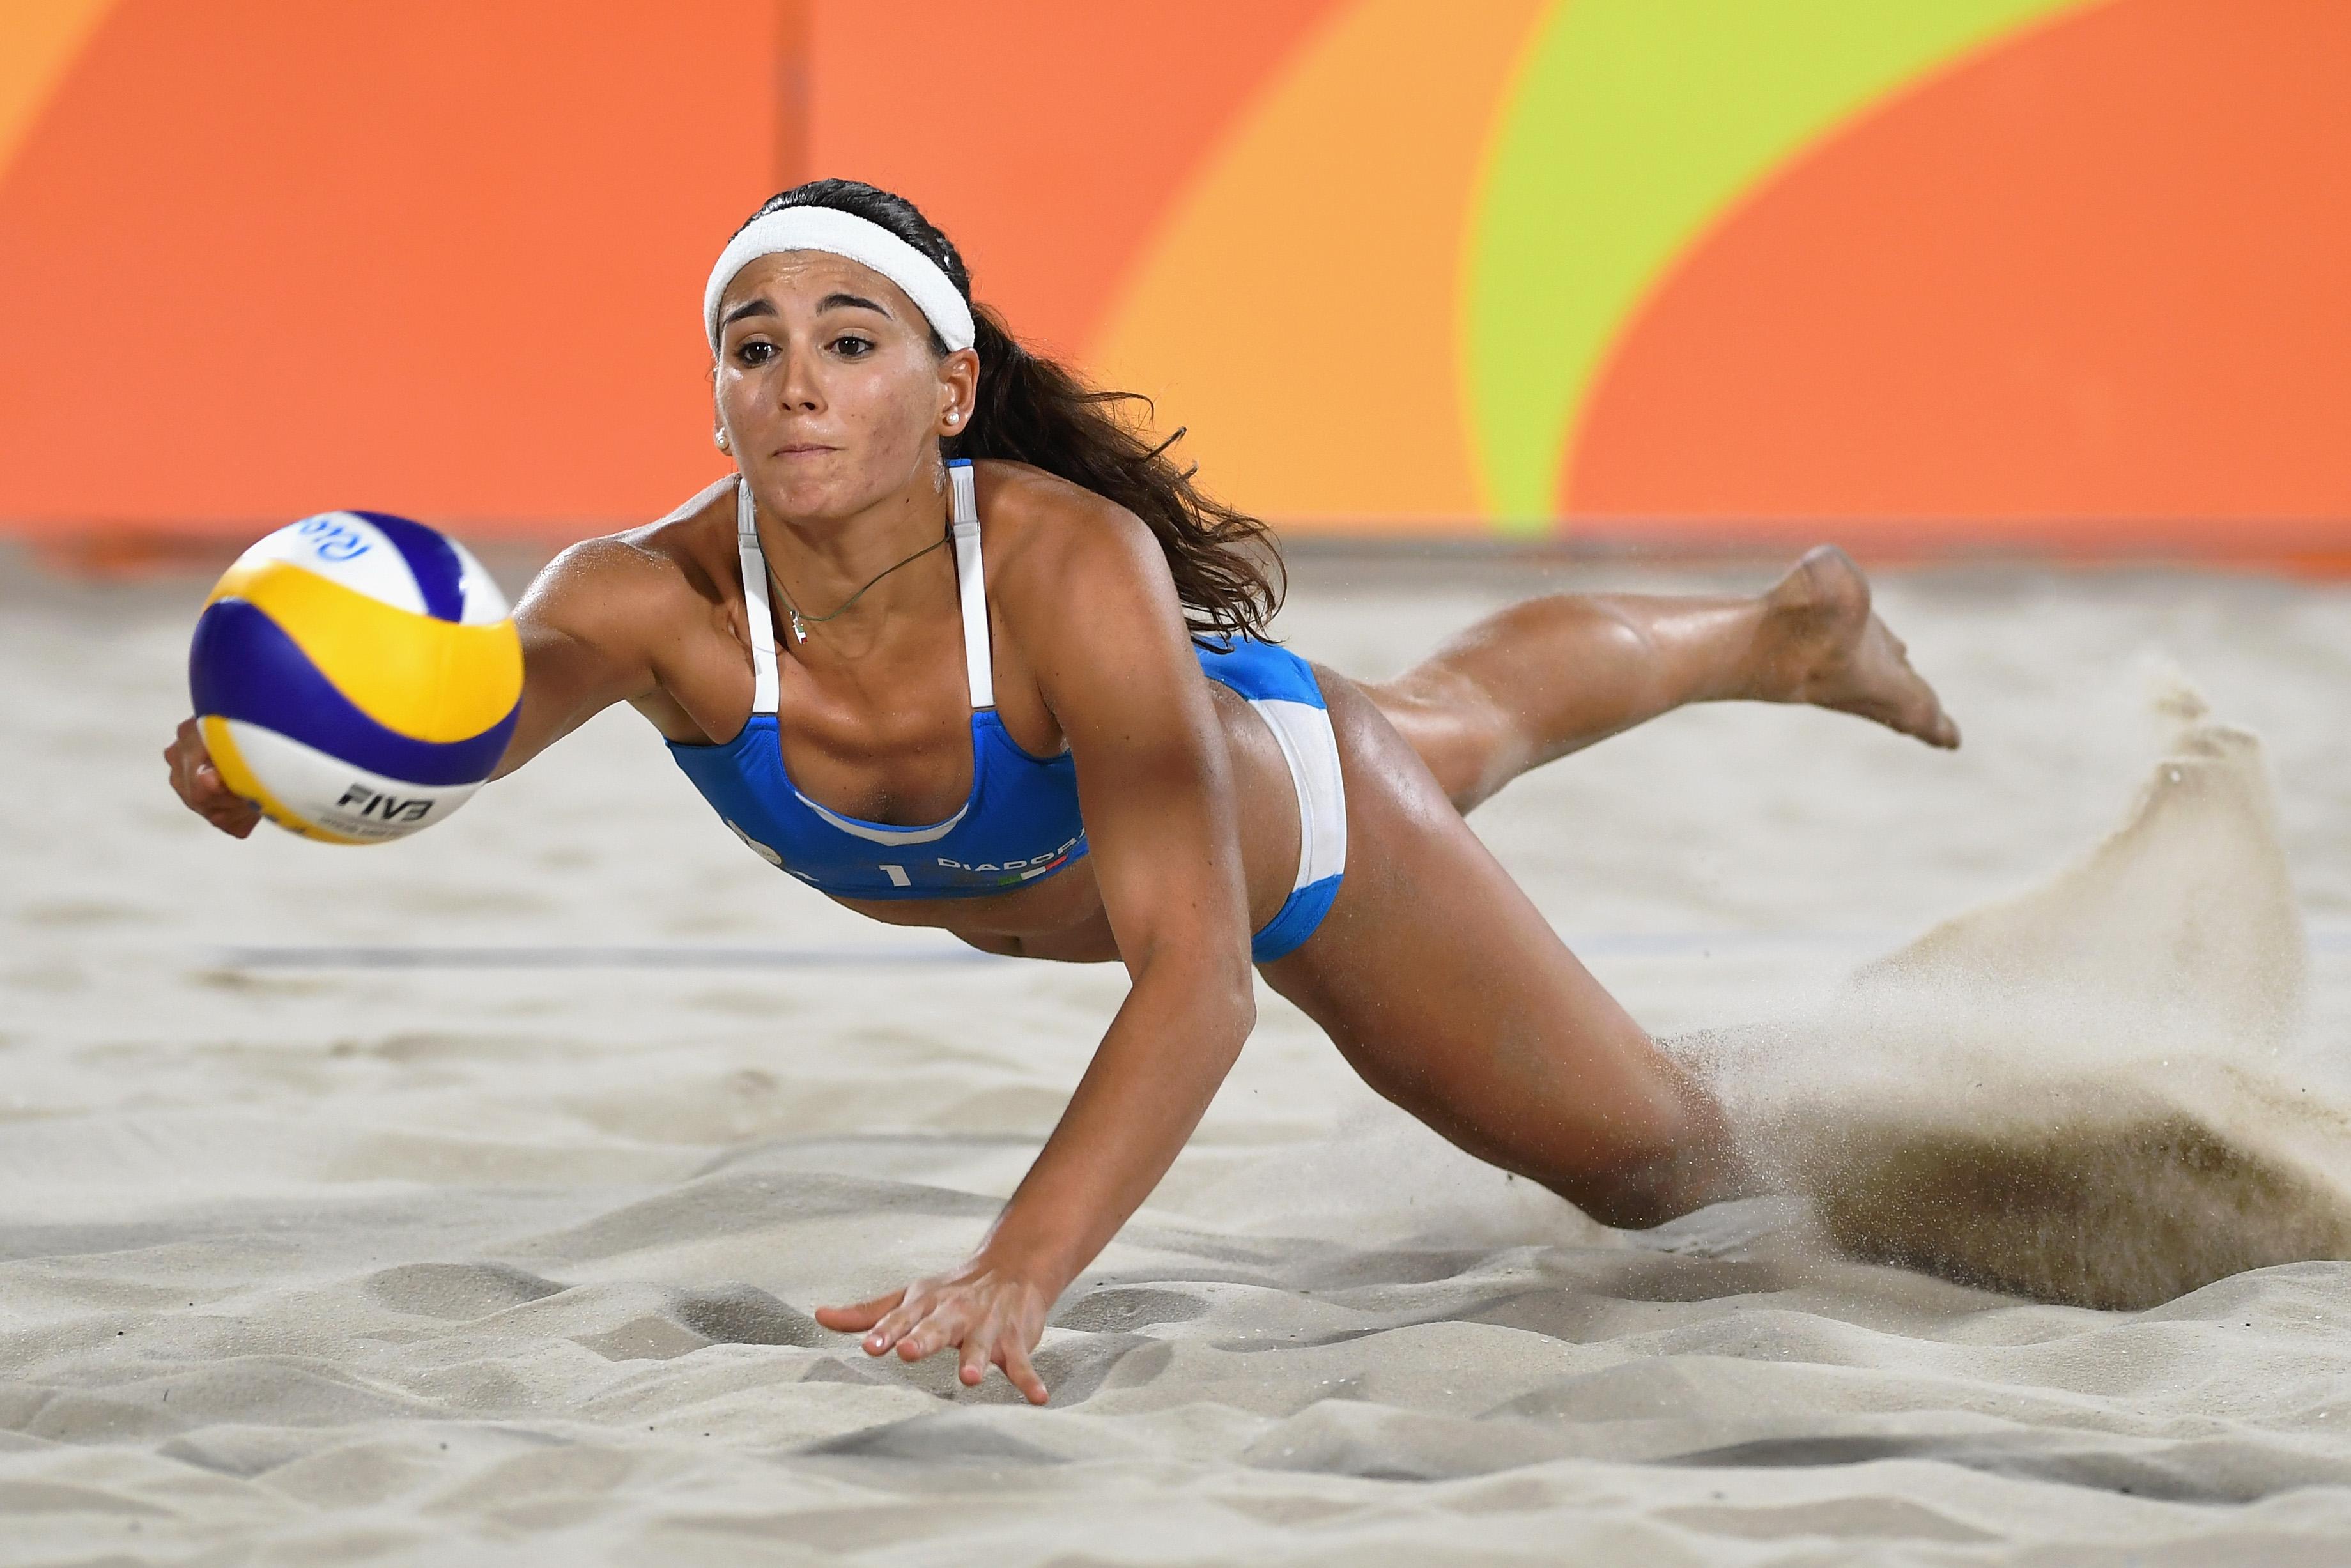 Marta Menegatti, Olympics, beach volleyball